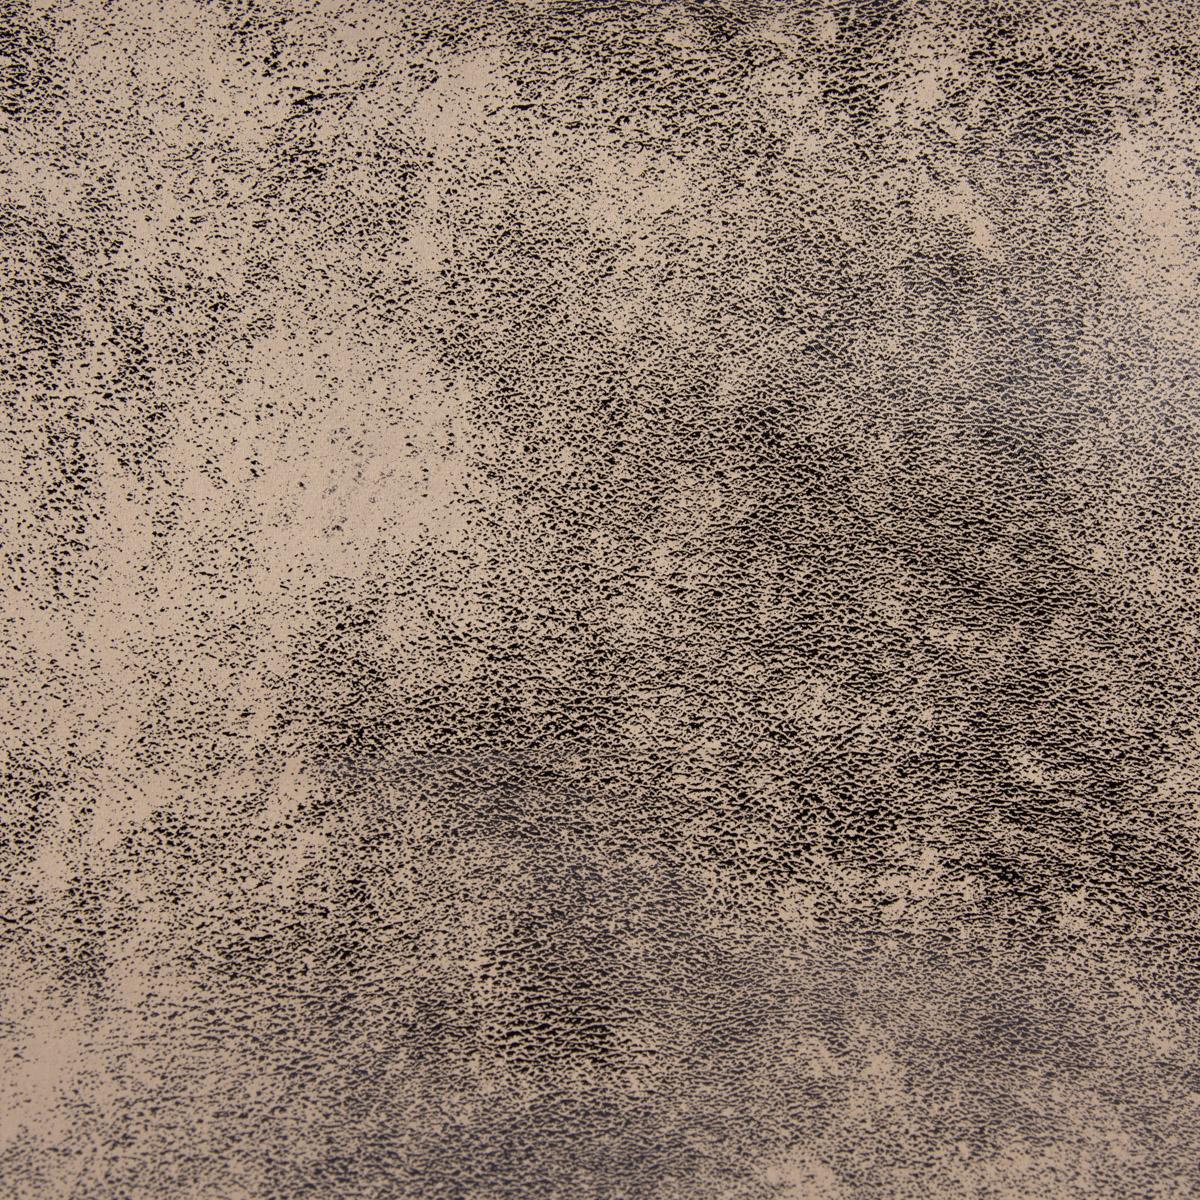 Kunstleder Lederimitat Wildlederoptik beige schwarz-glänzend 1,4m Breite